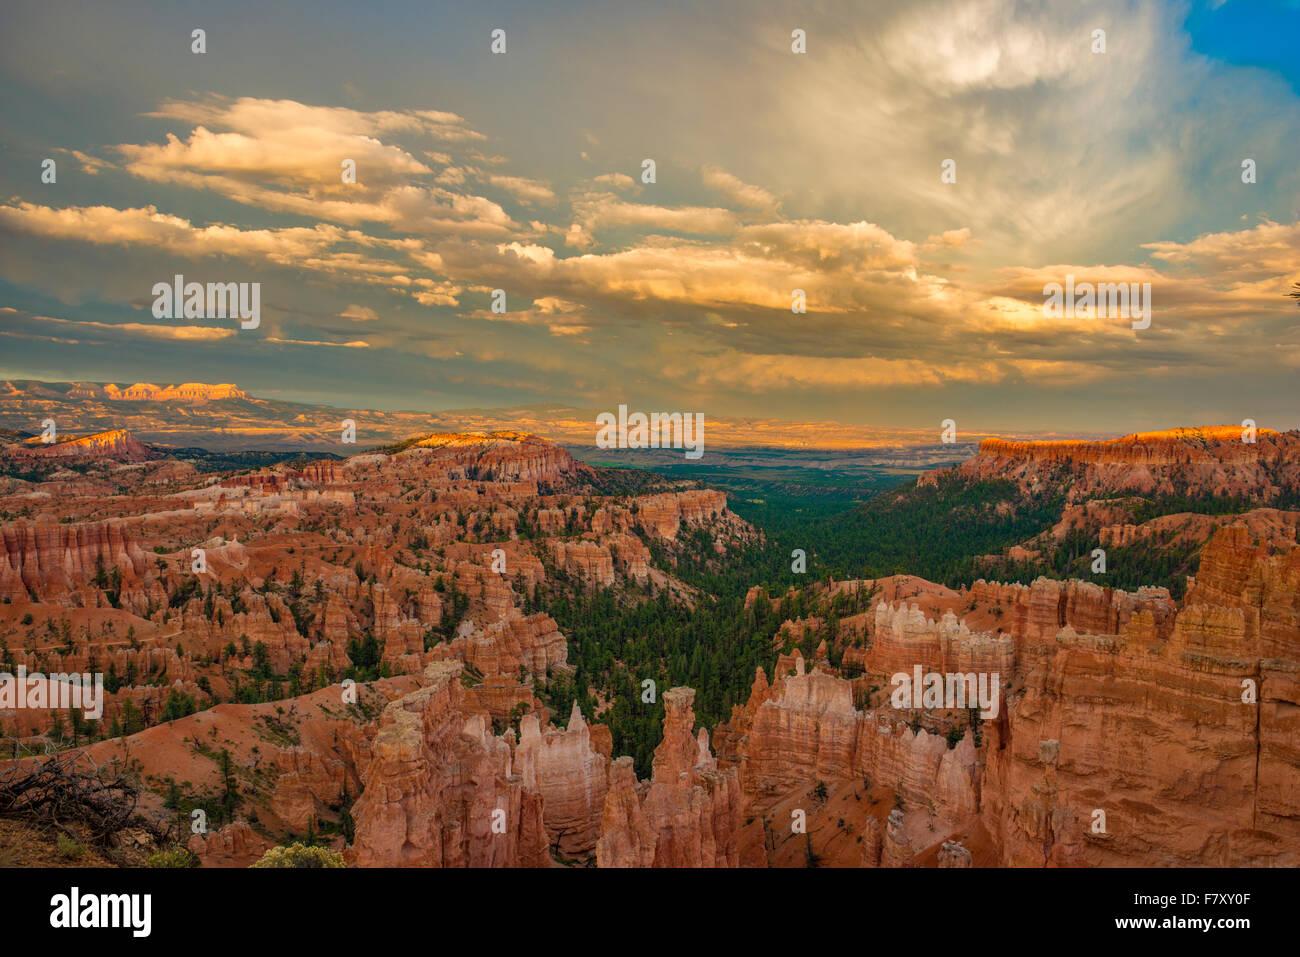 Sunset Point de vue, le Parc National de Bryce Canyon, Utah, pinacles calcaires Wasatch Photo Stock